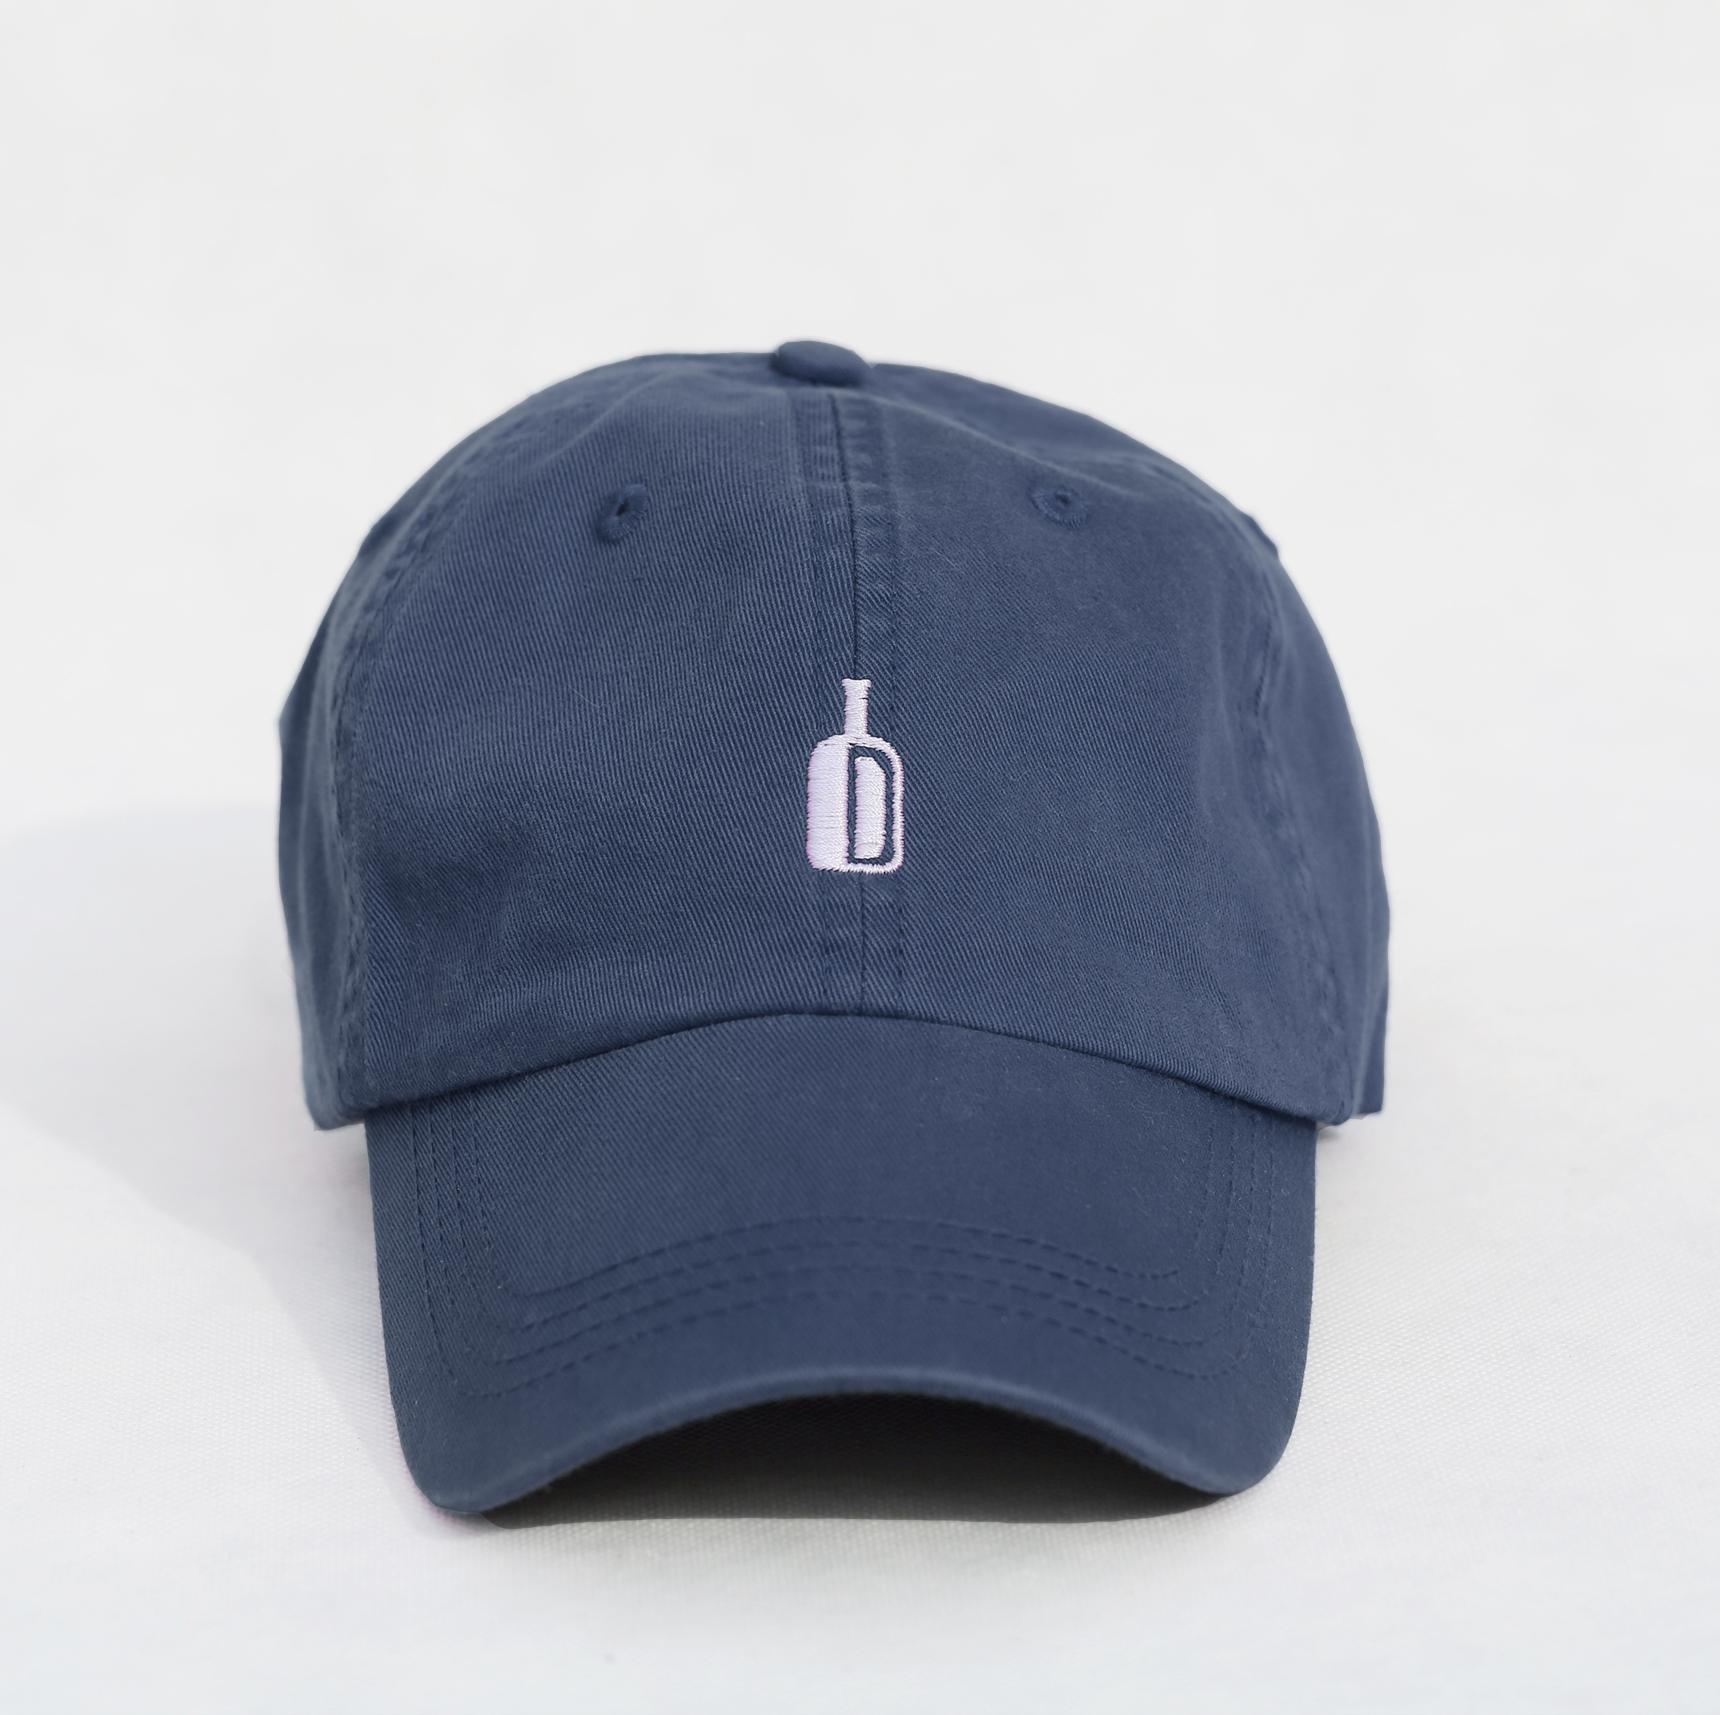 90 PROOF HAT